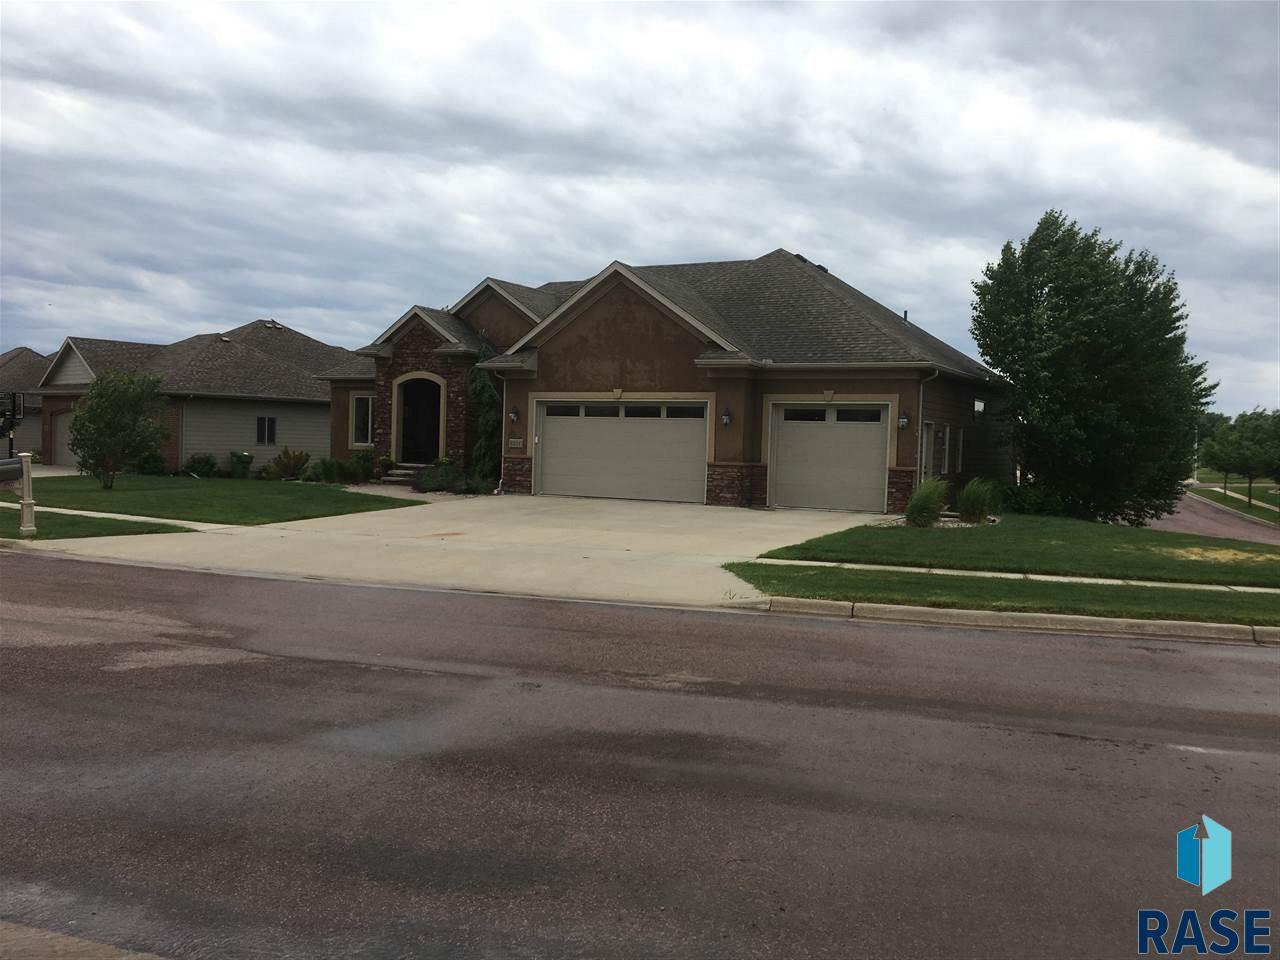 8201 S Grass Creek Dr, Sioux Falls, SD 57108